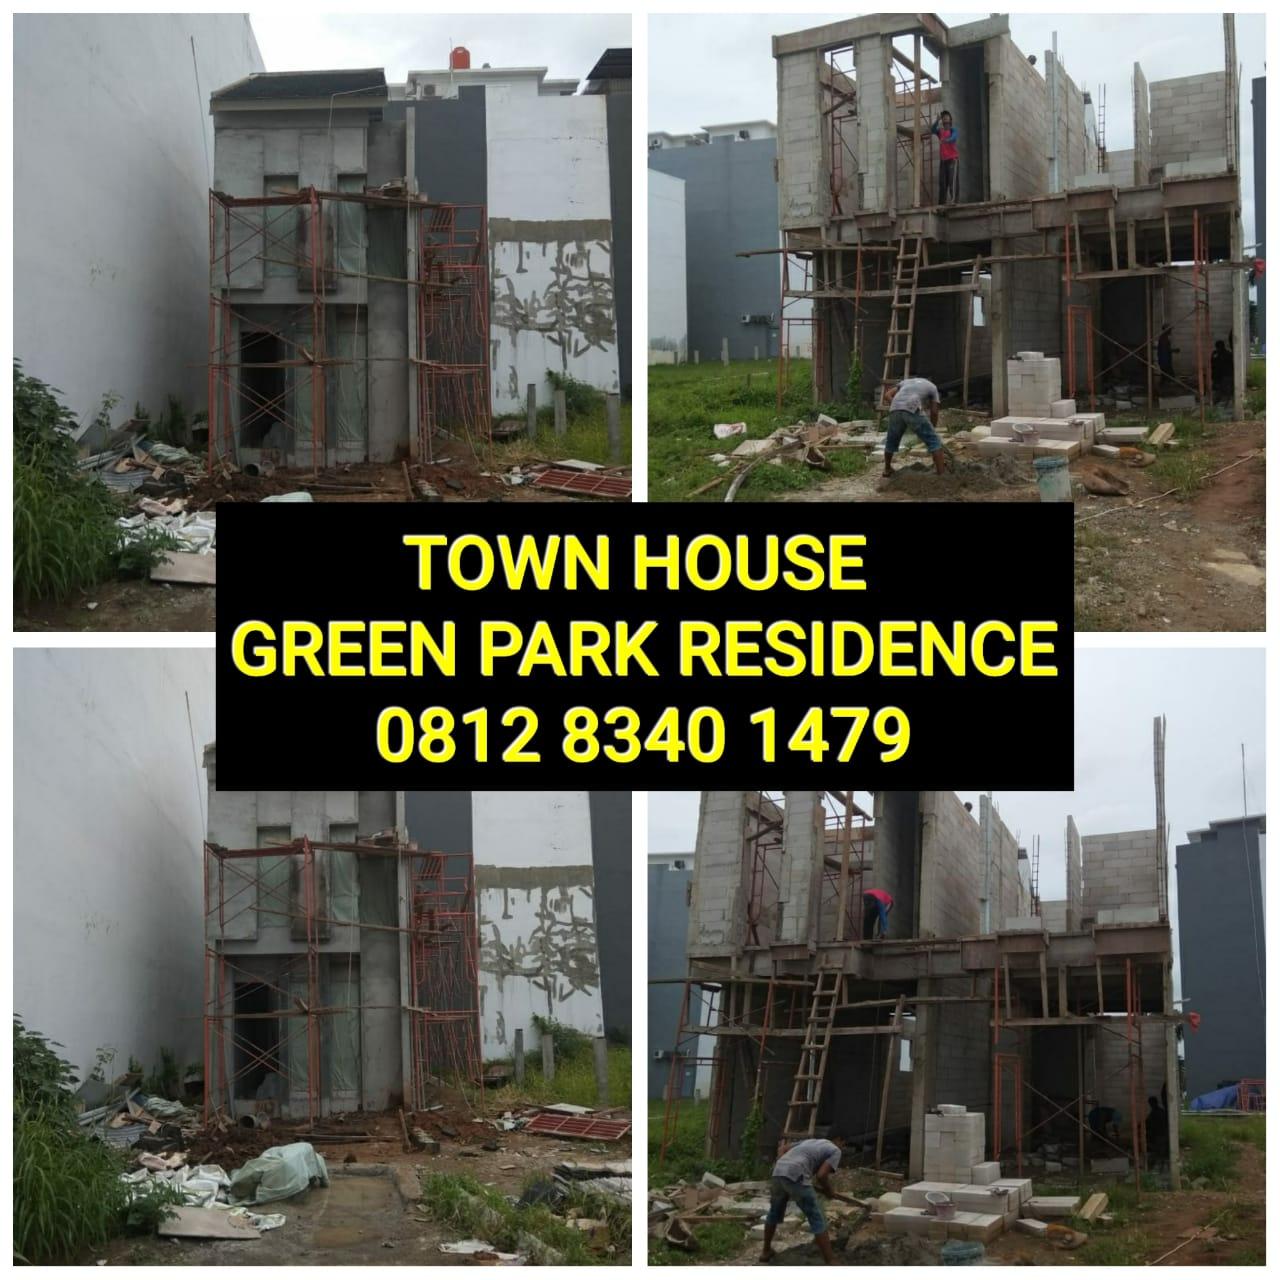 Town House Green Park Residence